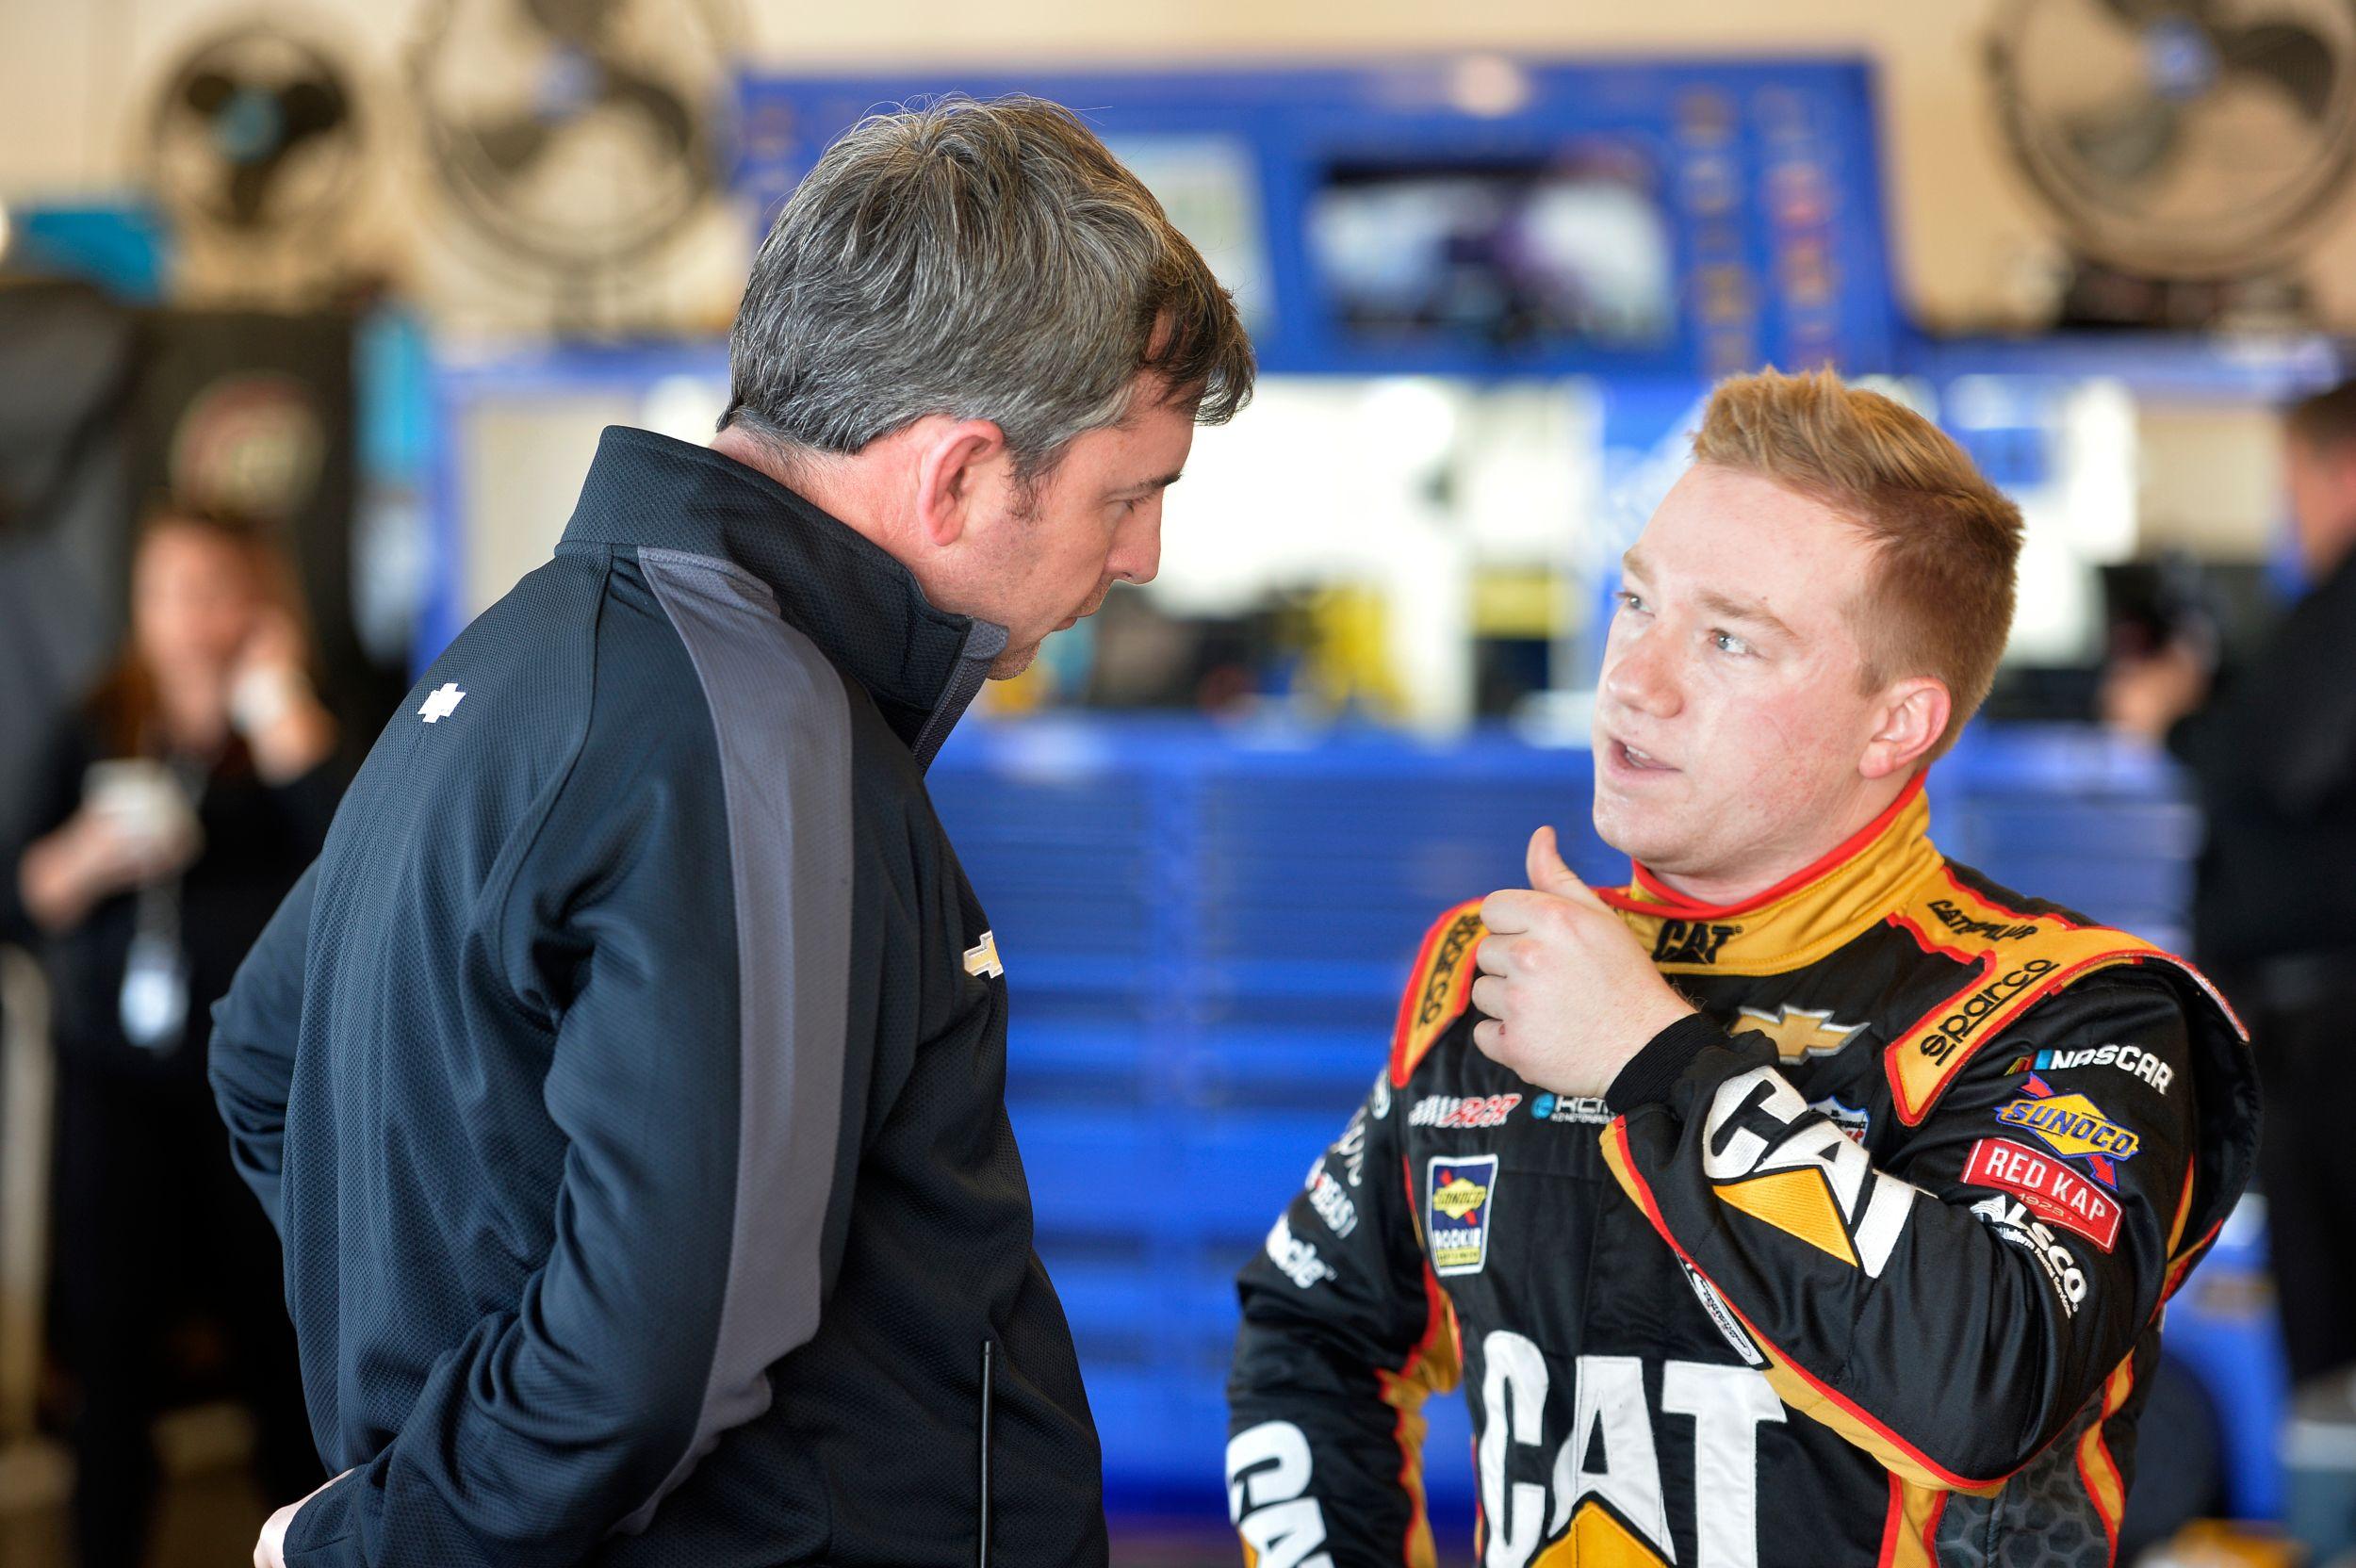 Randall and Tyler talk strategy at Daytona.